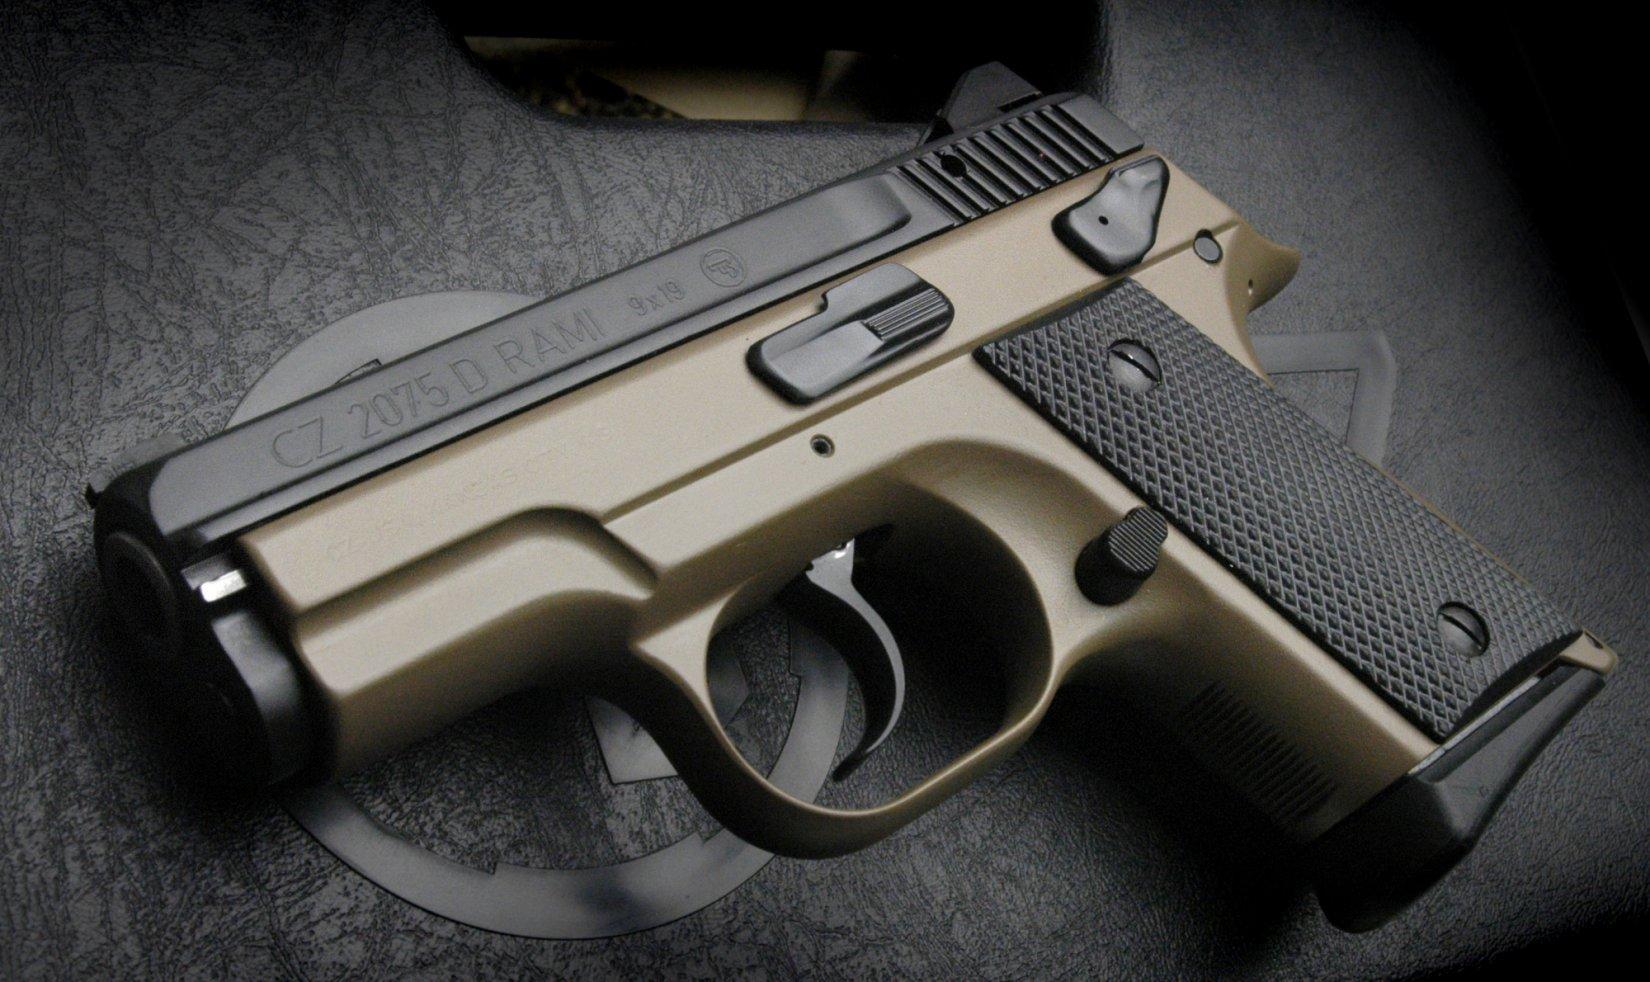 CZ 2075 RAMI BD (Decocker): Big Gun Performance in a Sub